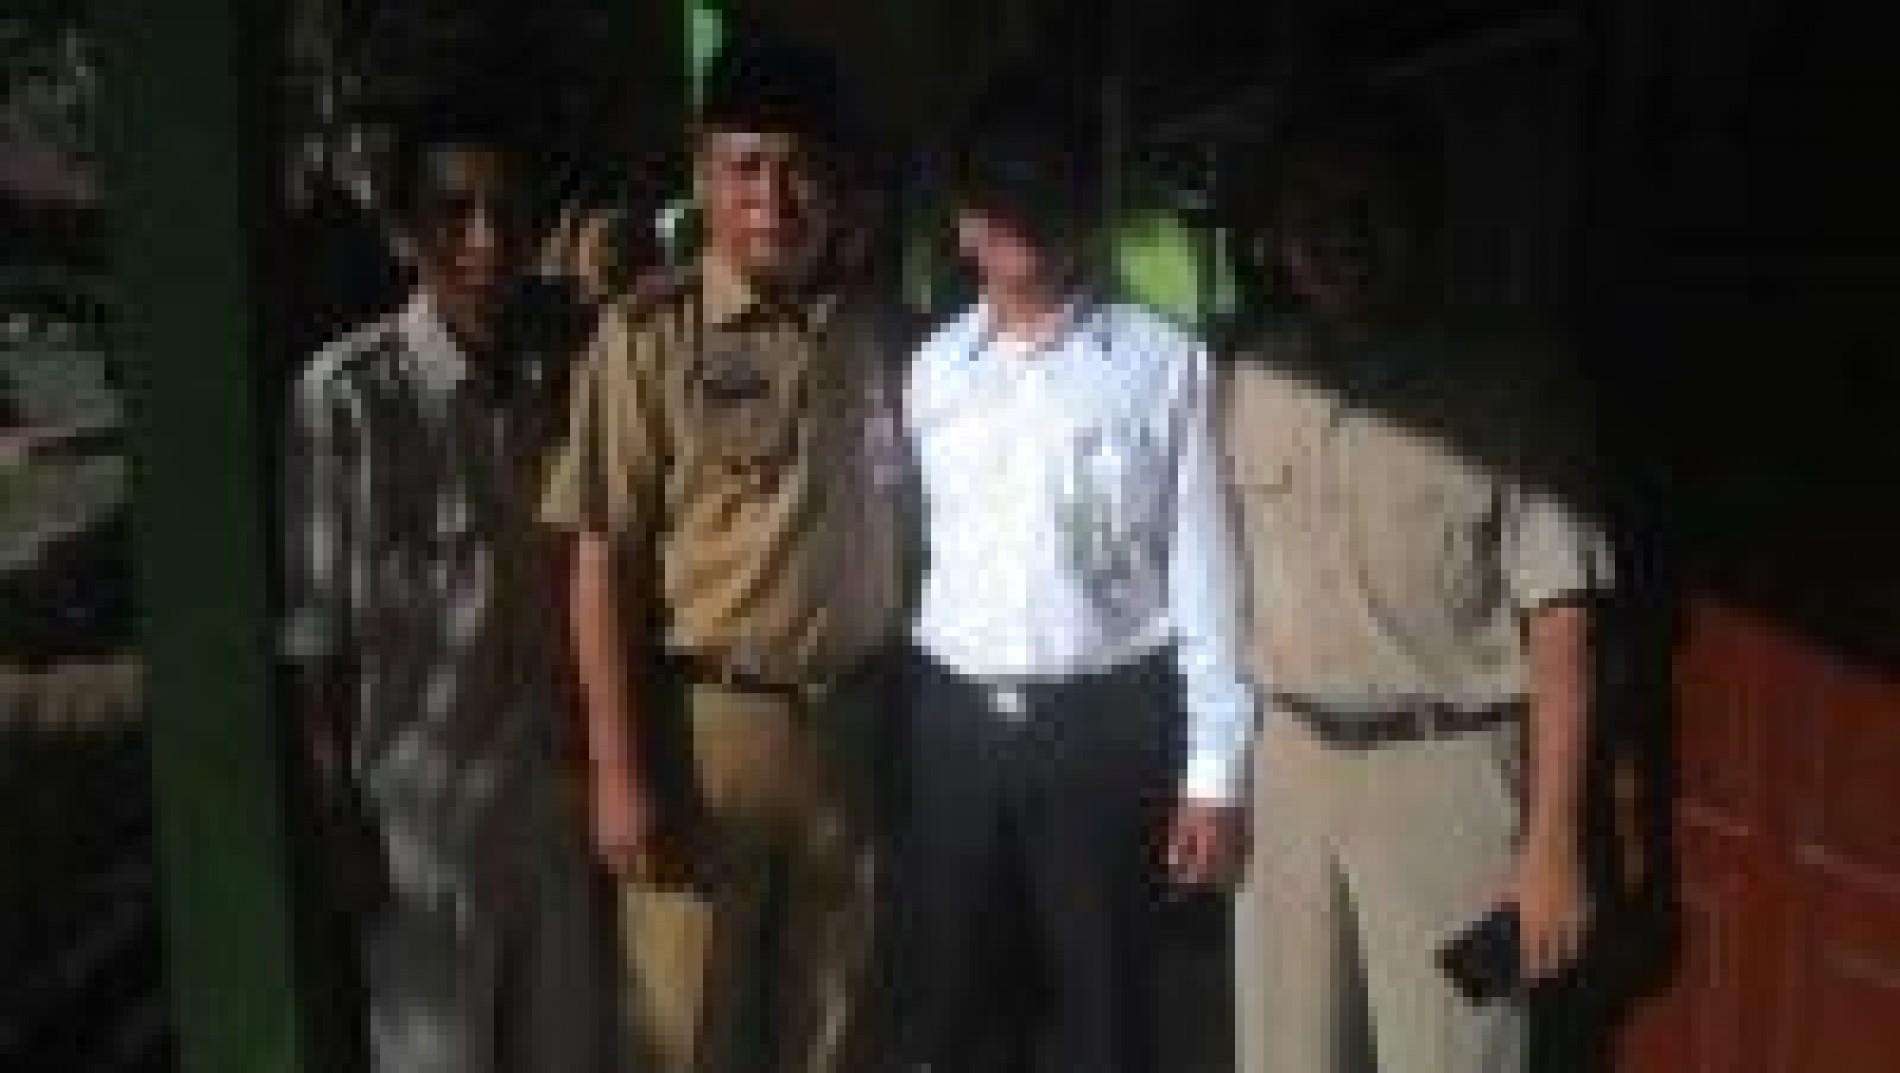 Kunjungan Paman Birin (Gubernur Kalimantan Selatan) ke SMAGA